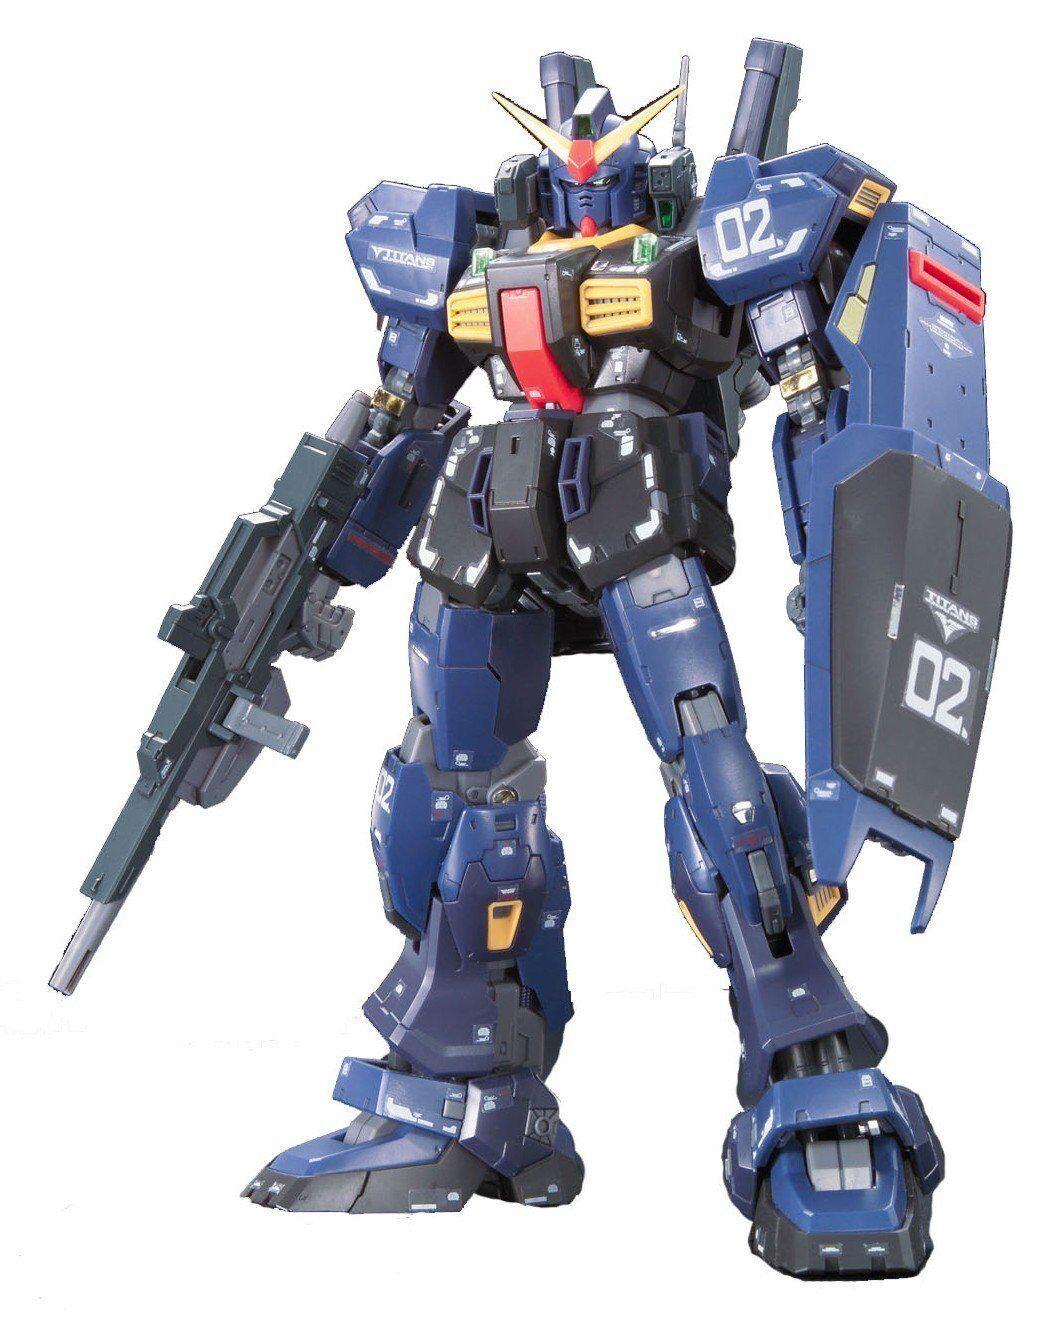 RG 1 144 RX -178 Gundam Mk - II (Titans' Spec) (Mobile Suit Z Gundam) From Japan